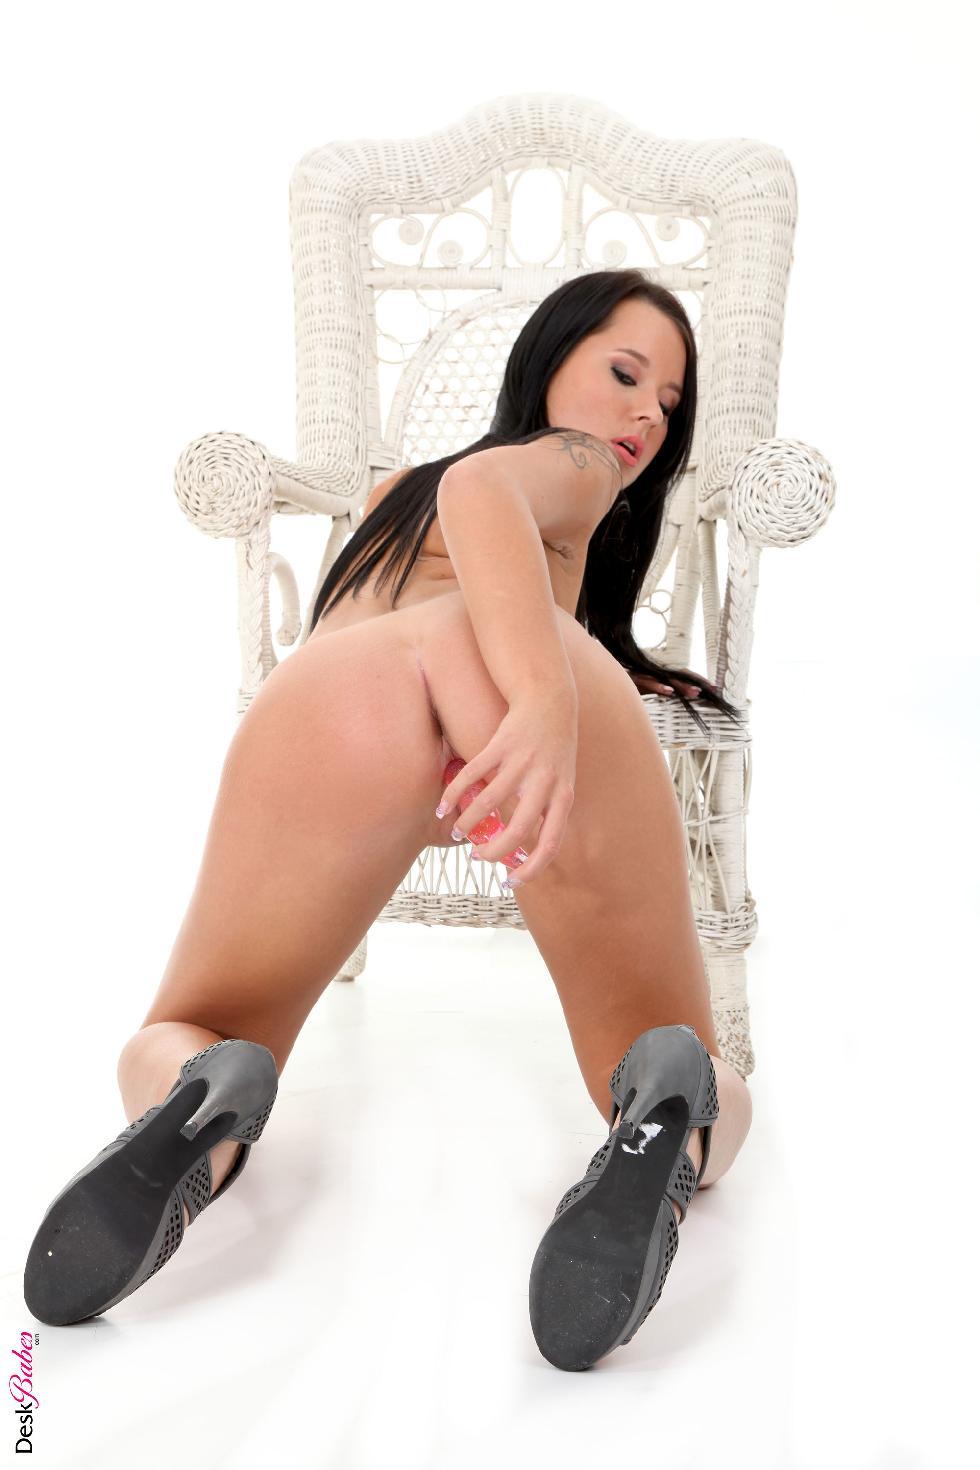 Sexy Mia Manarote and her pink pleasure - 16